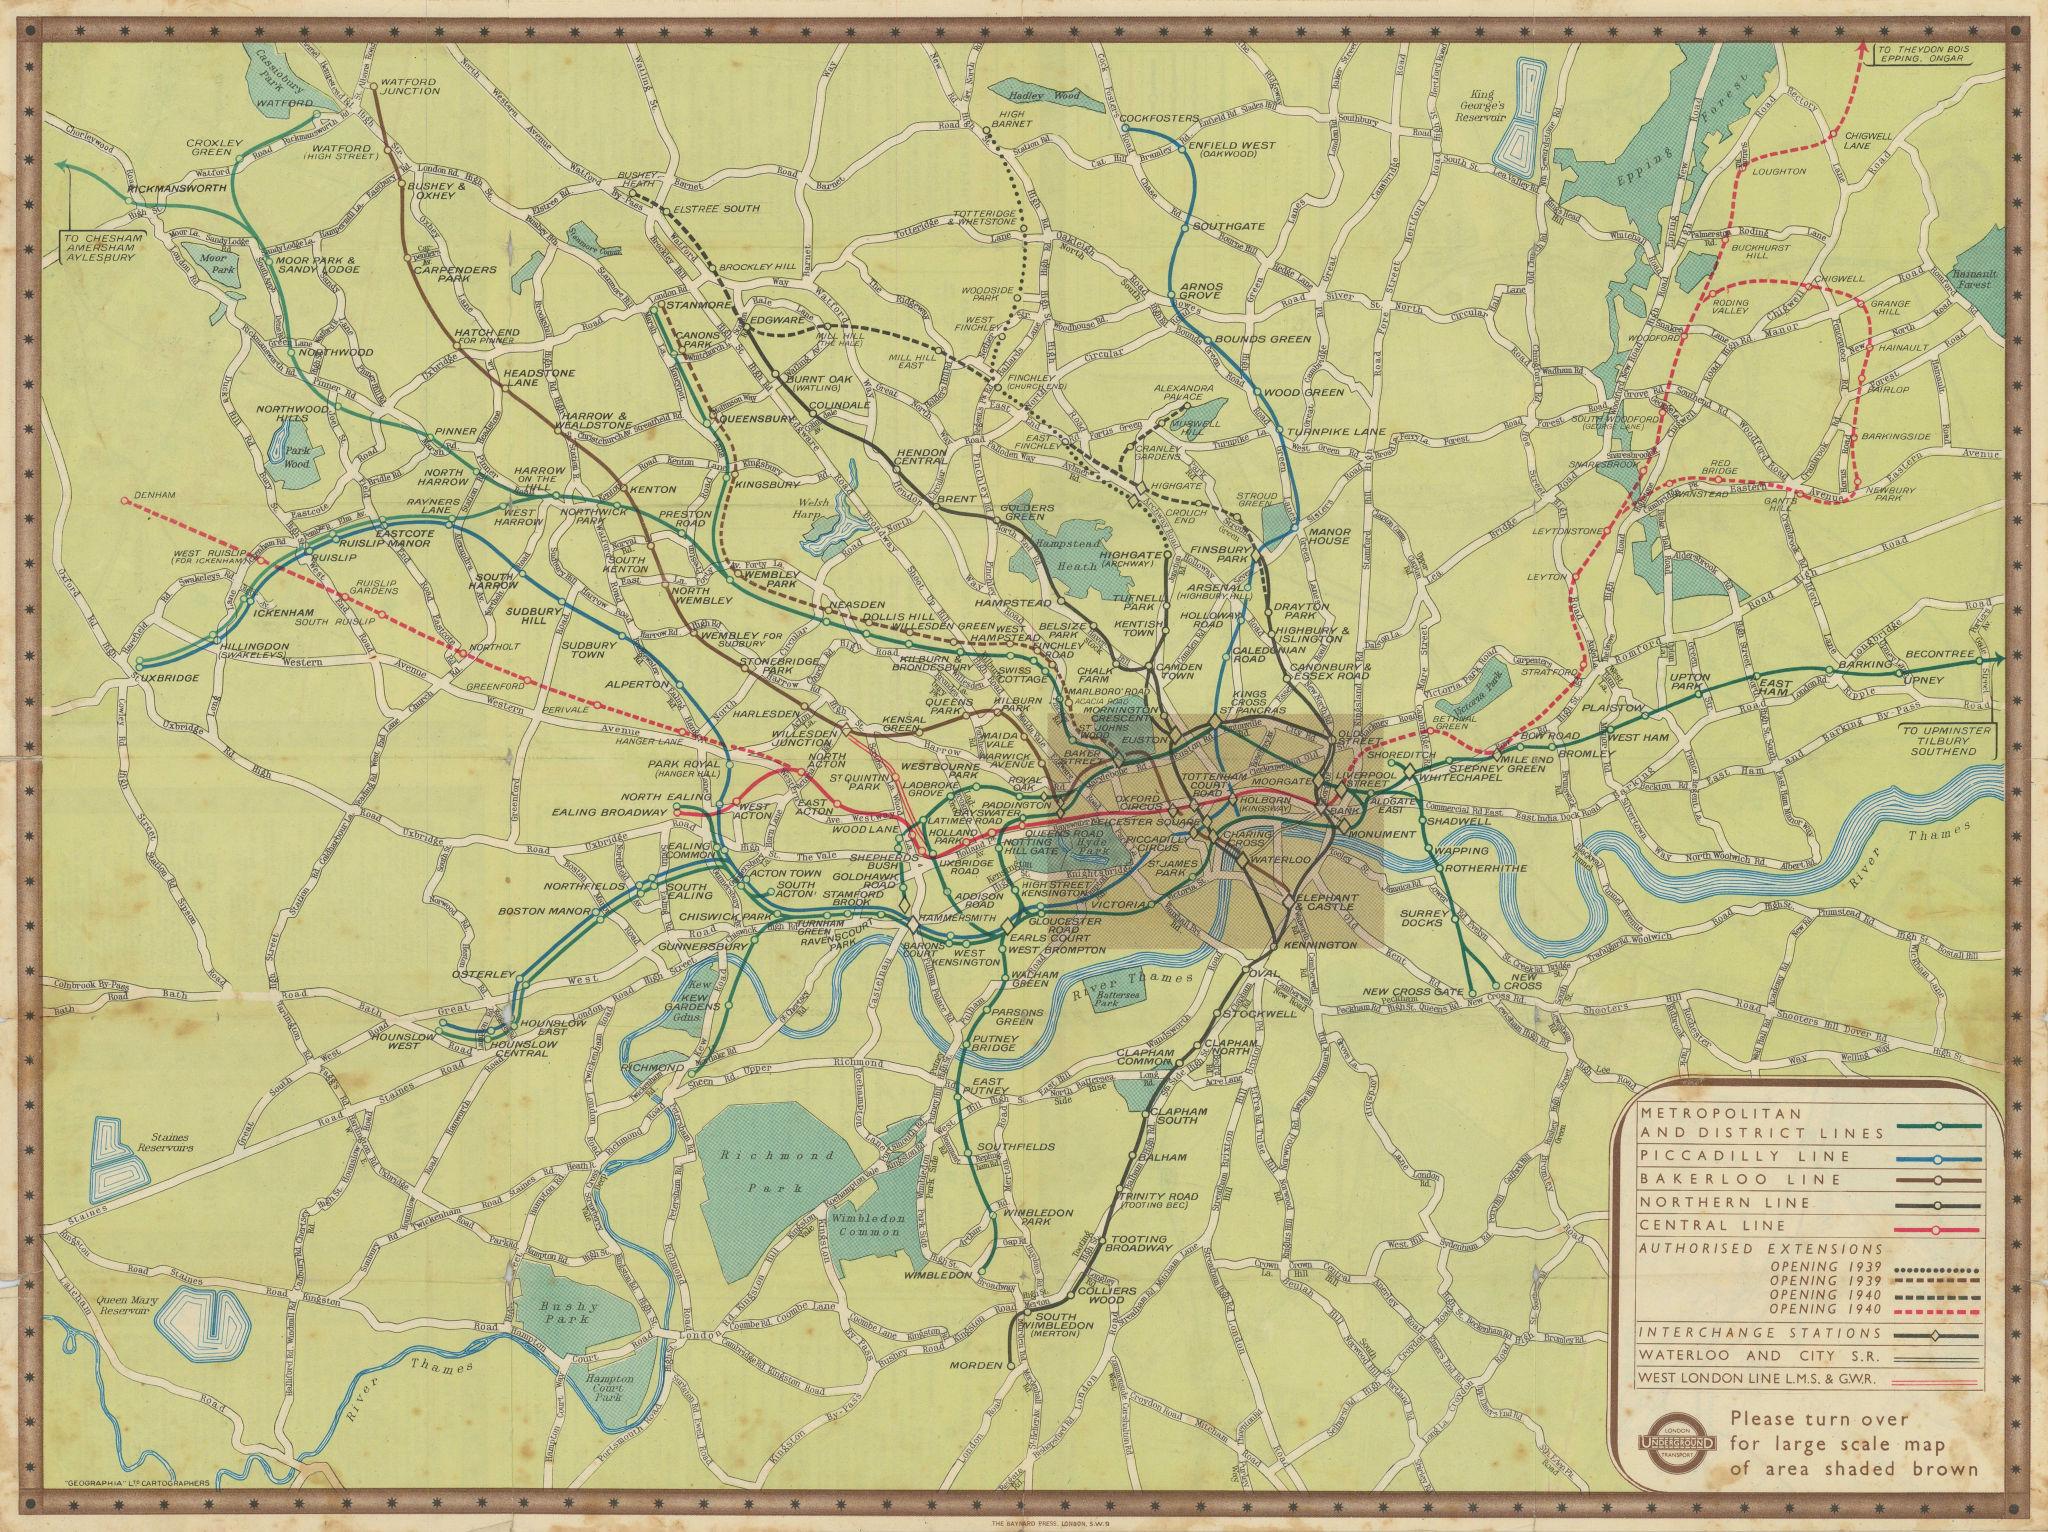 London Transport Underground Railway map #2 1938 old vintage plan chart